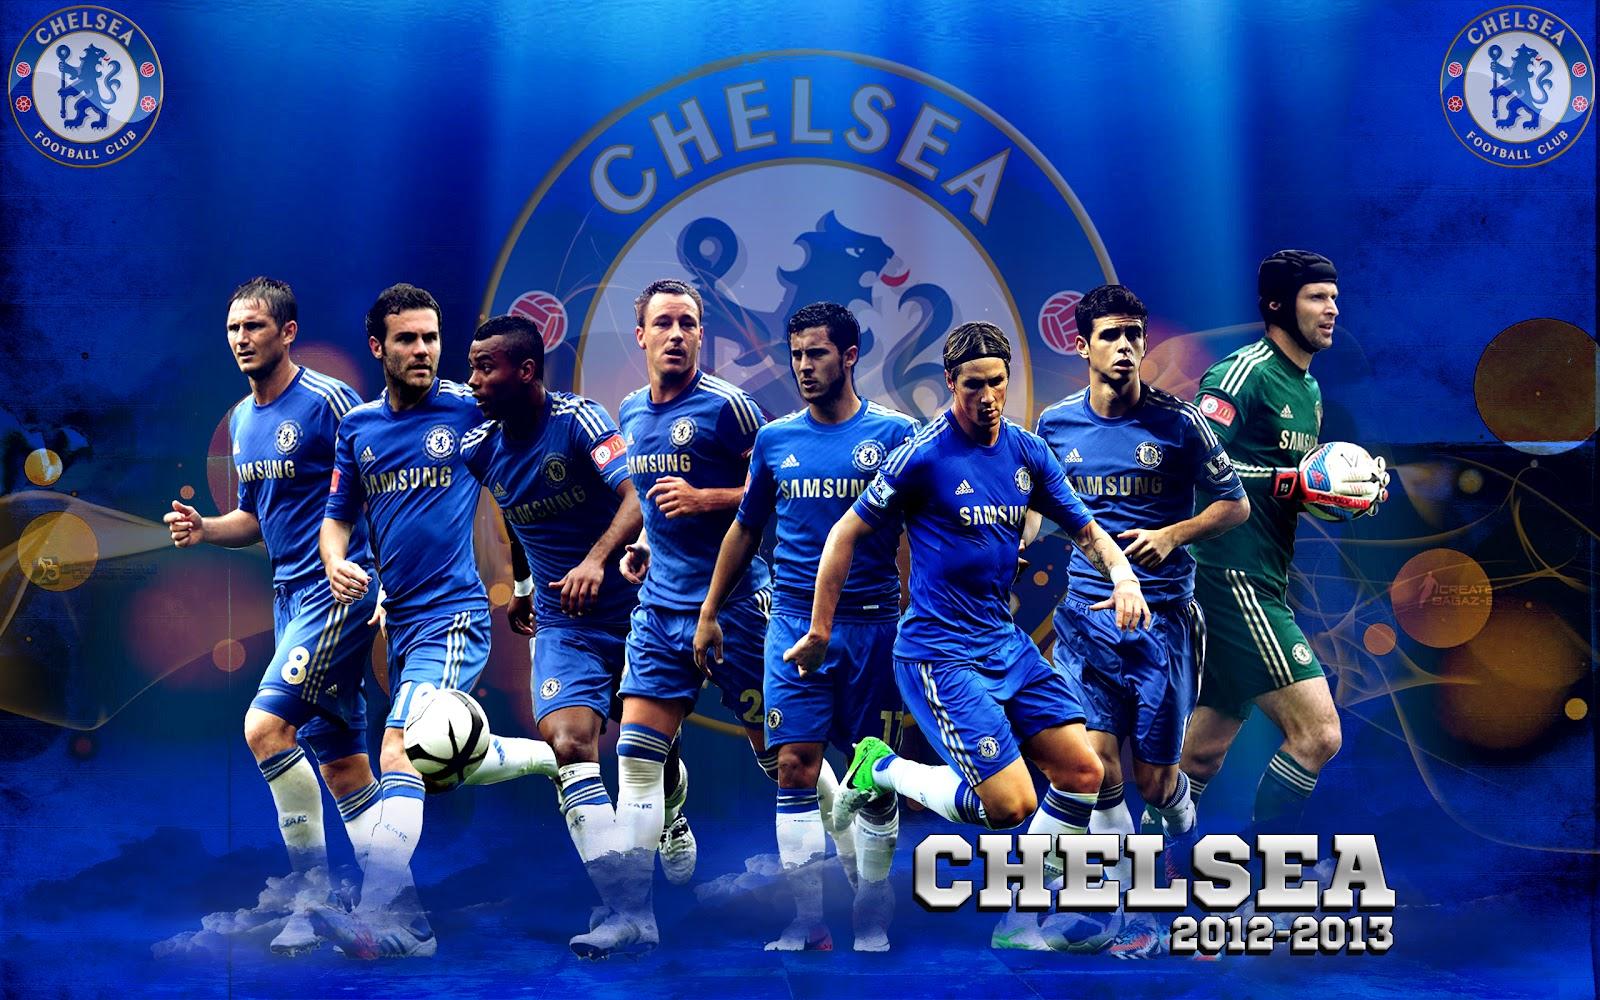 http://3.bp.blogspot.com/-d_3rFkuWv08/UI5a_pXgPaI/AAAAAAAAG58/yLwdIwLE6Mo/s1600/Chelsea+FC+Wallpapers+2012-2013+09.jpg